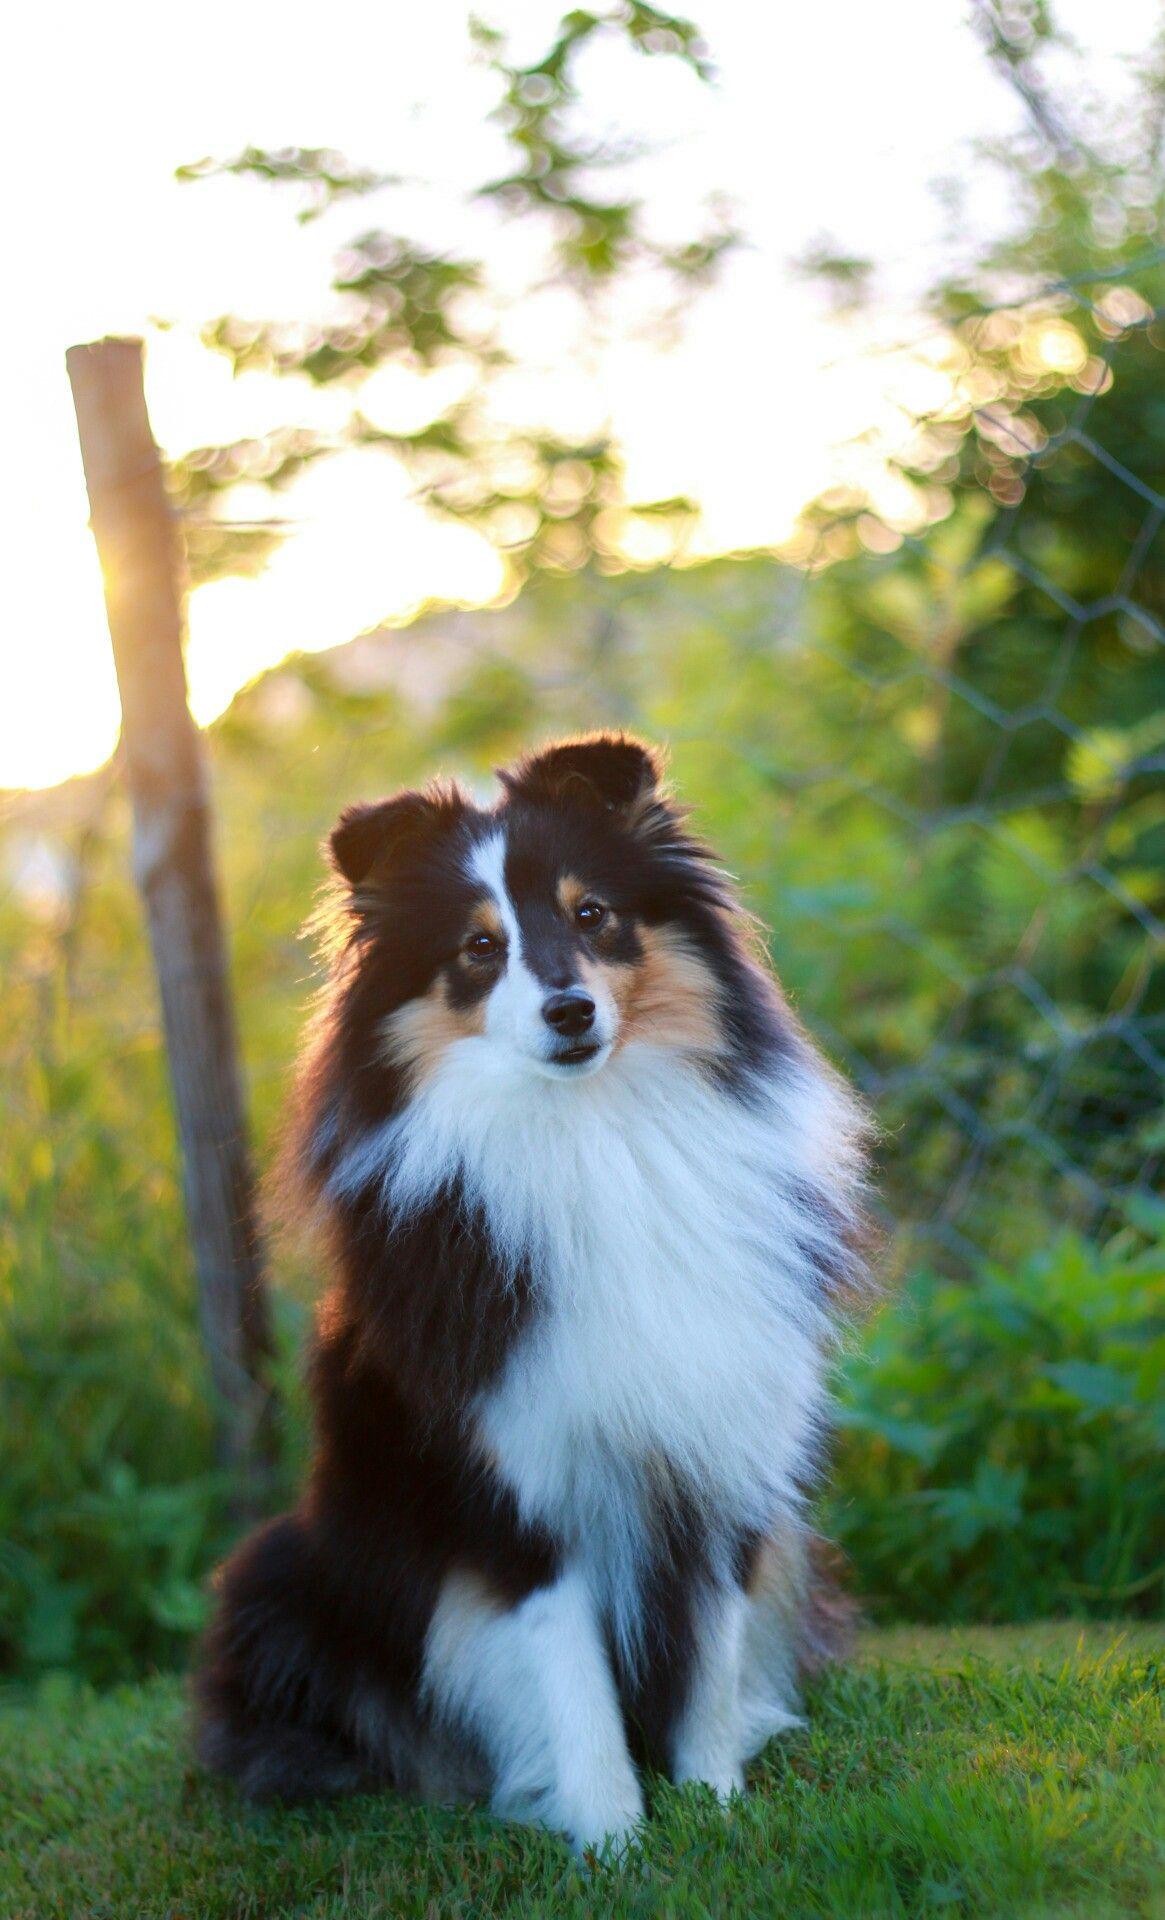 Pin By Kristine Eker On Dogs Sheltie Dogs Shetland Sheepdog Puppies Dogs